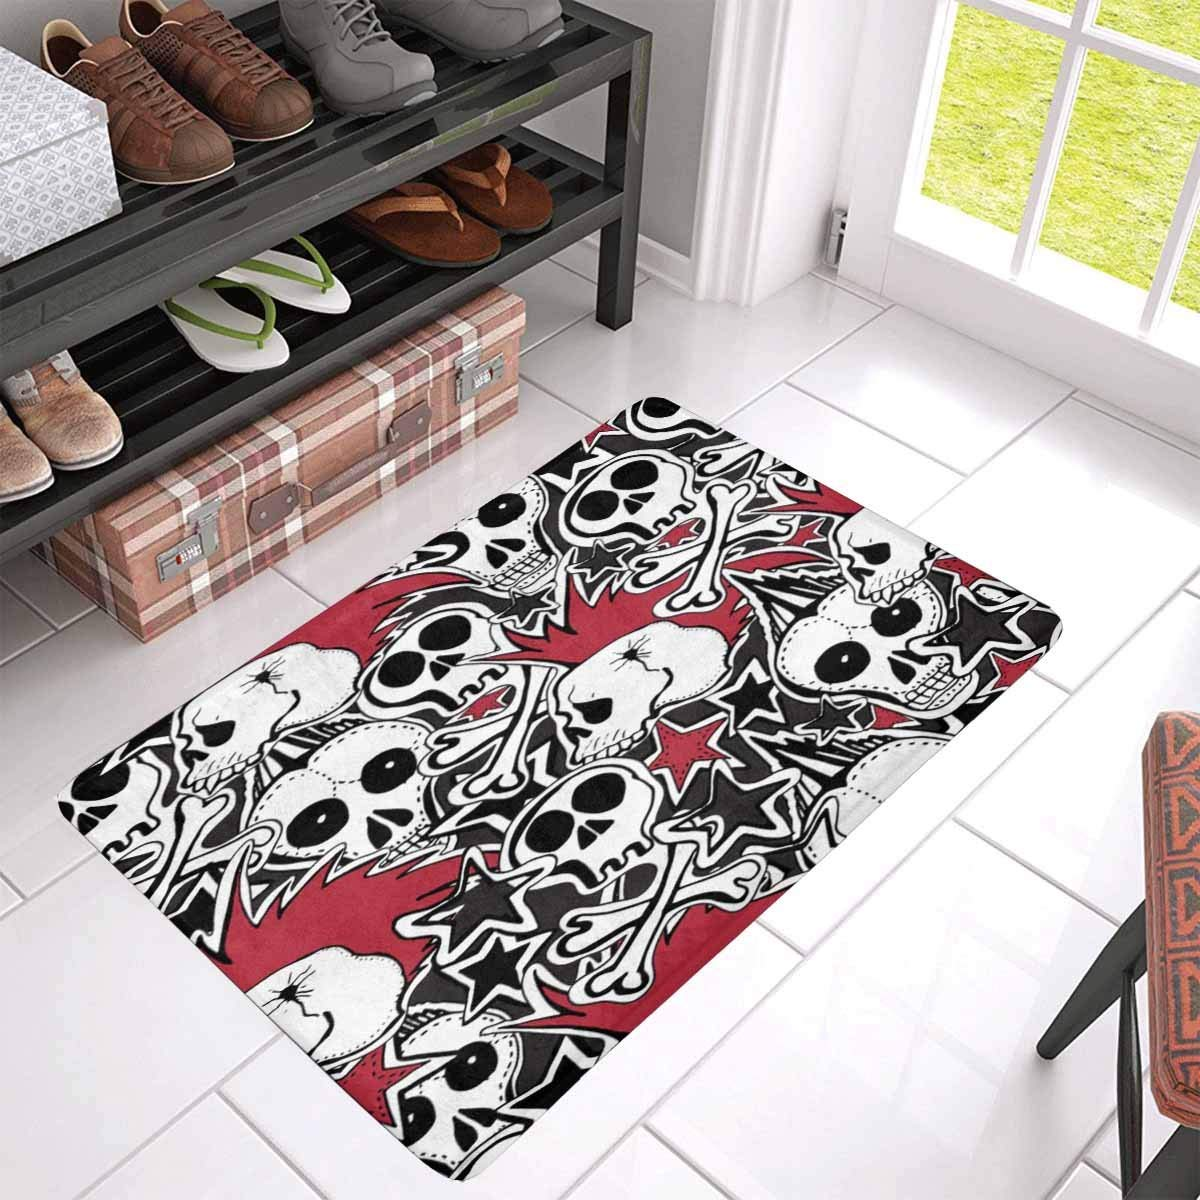 Funny Carpet Skull Printed Home Door Front Non Slip Mat Entrance Living Room